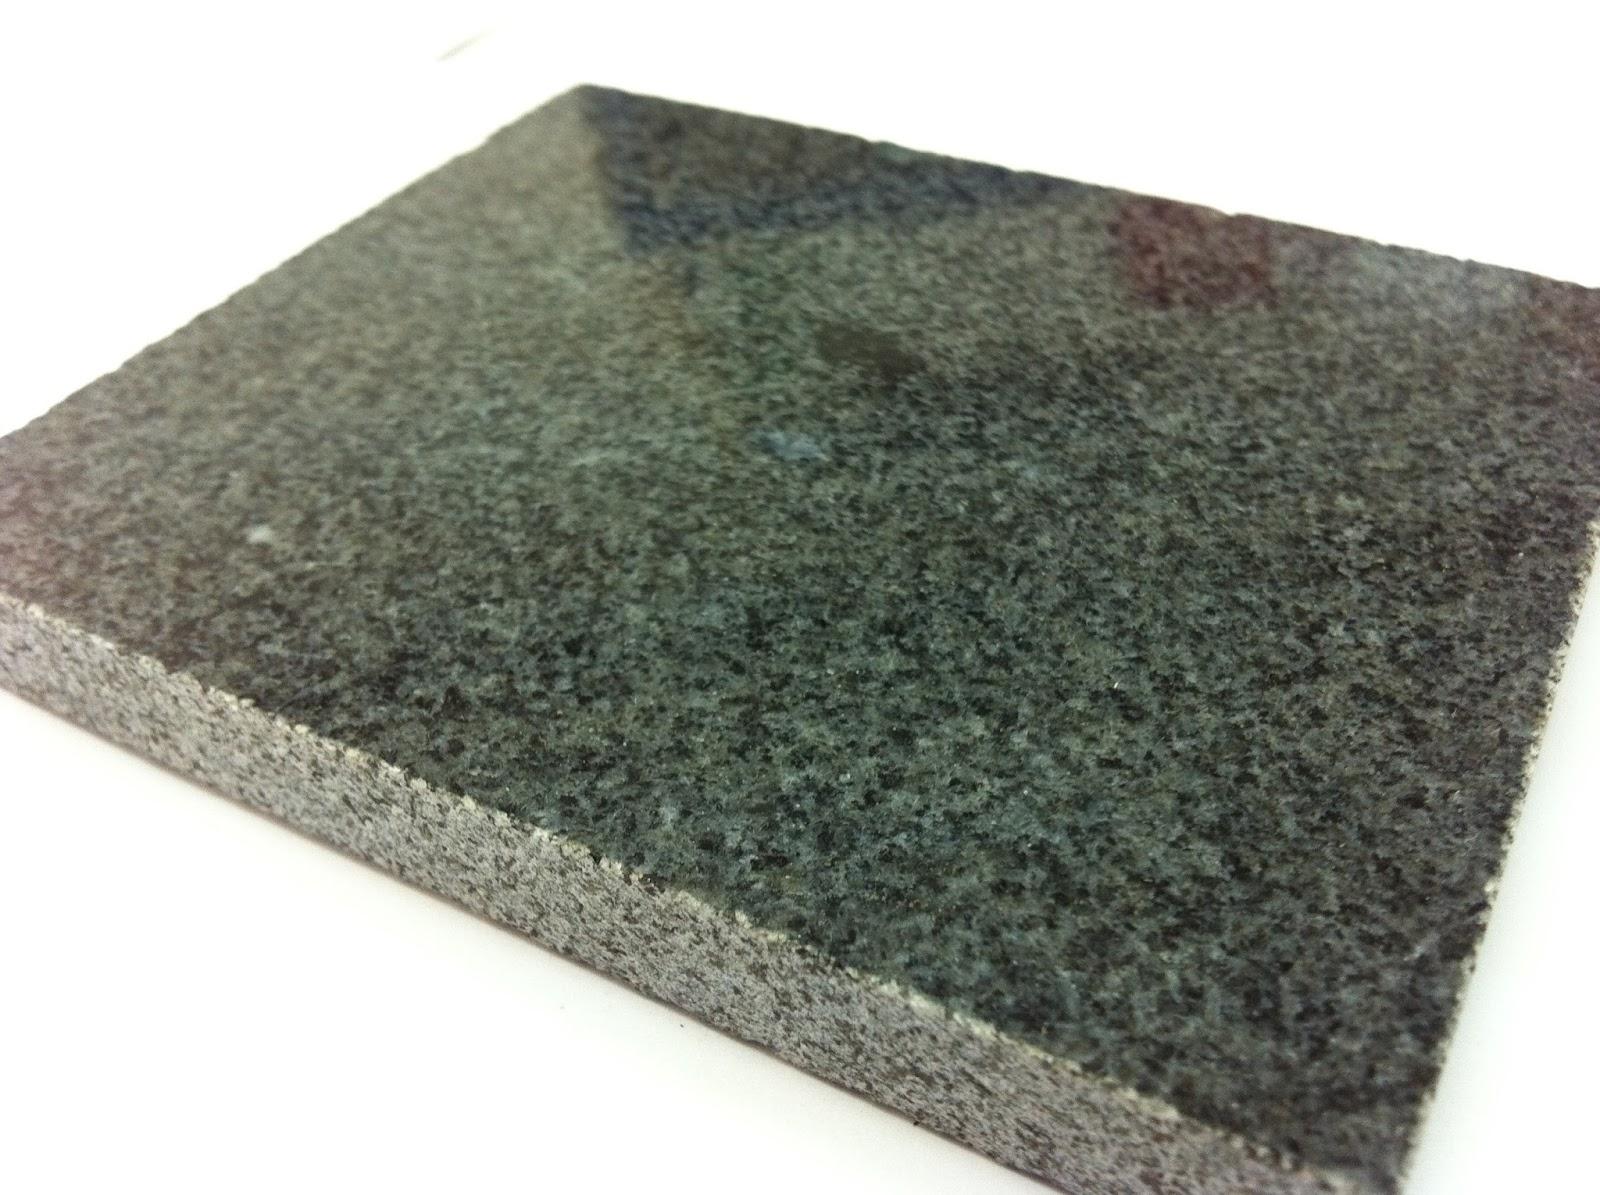 batu andesit hitam